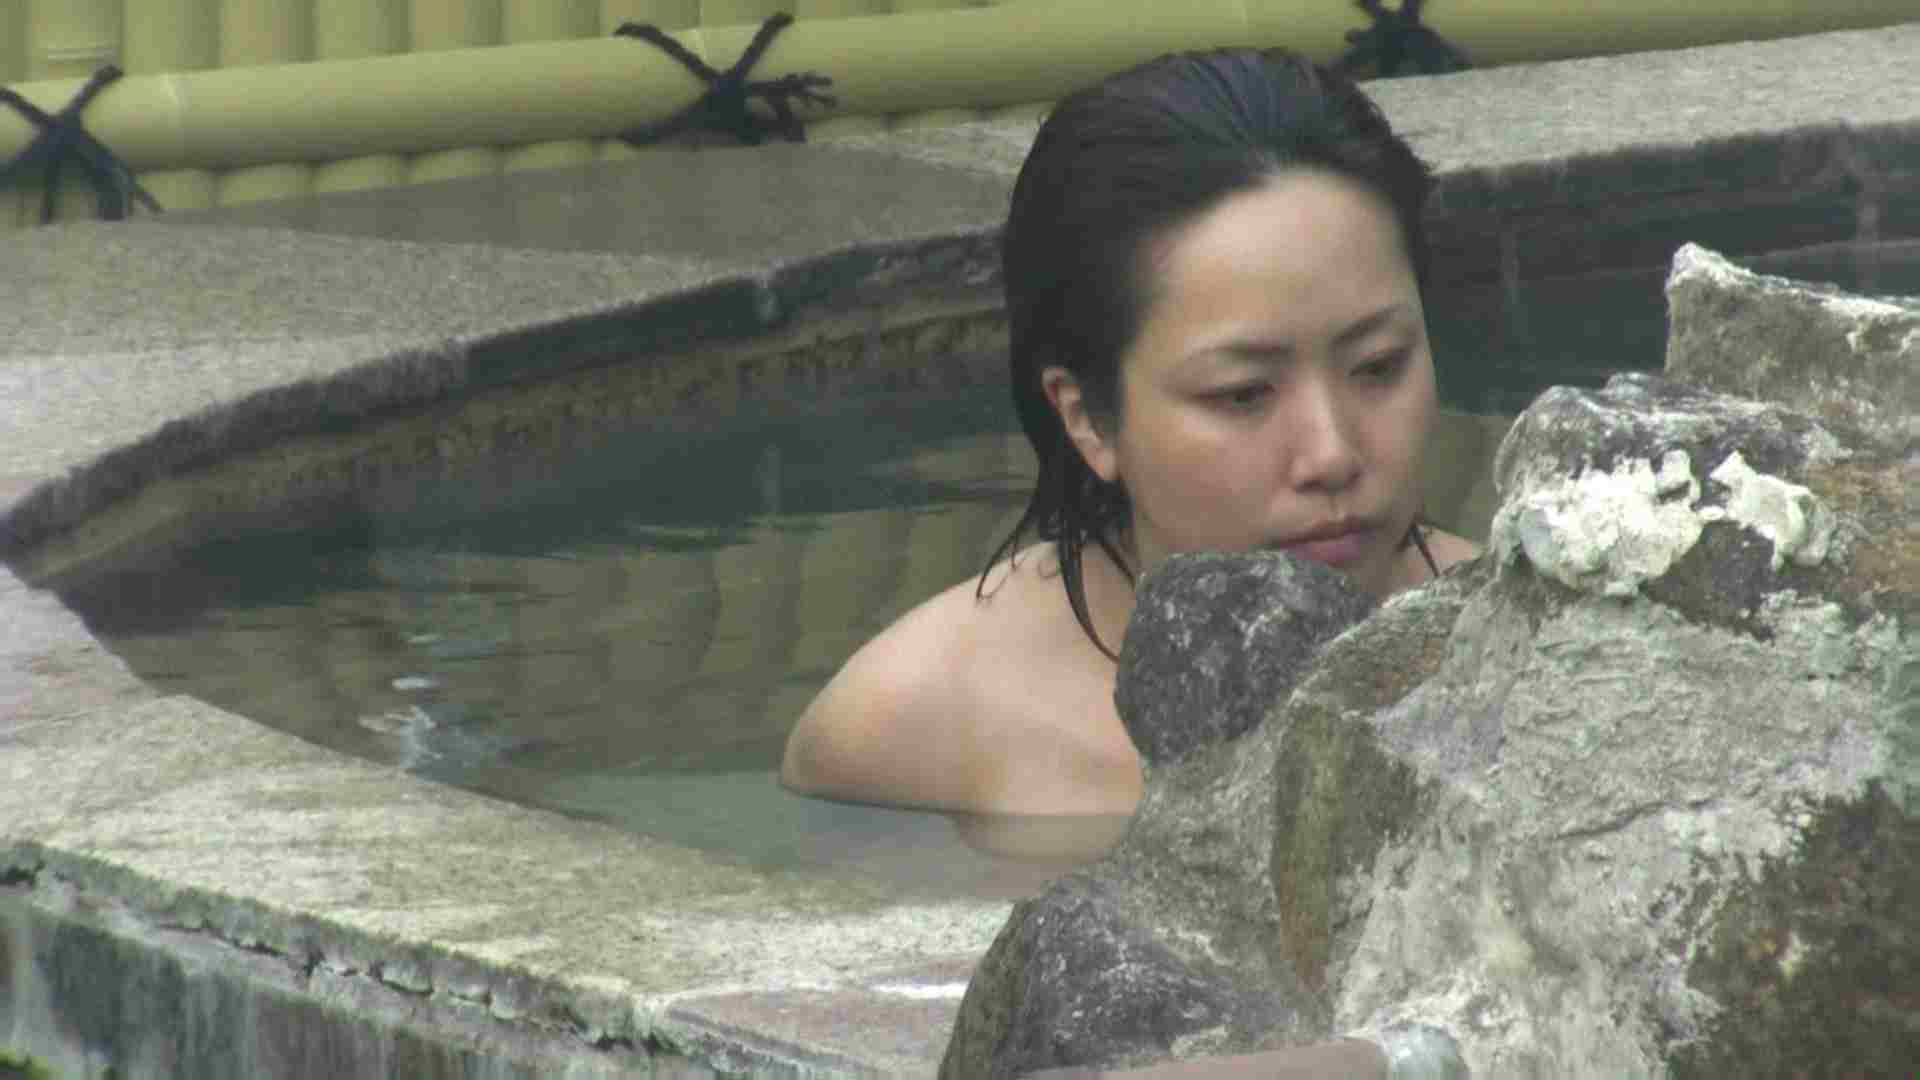 Aquaな露天風呂Vol.604 露天風呂編 | 盗撮シリーズ  89PIX 39